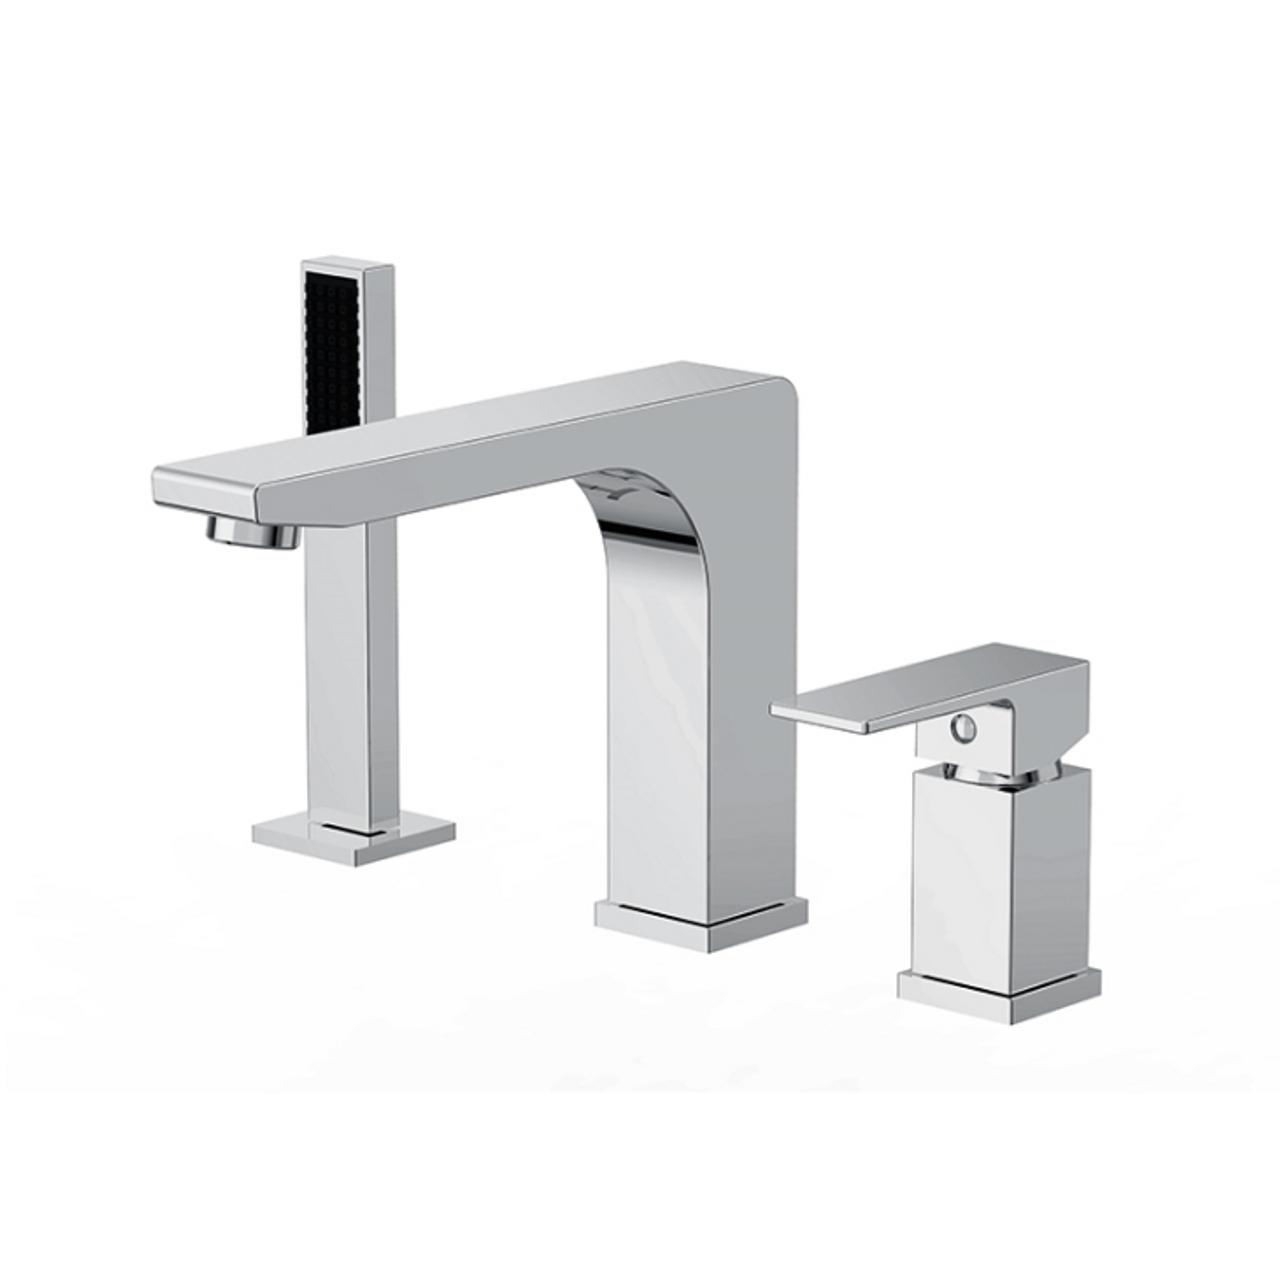 Royal Modern Roman Bath Brass Deck Mount Faucet With Hand Shower 3 Hole Tub